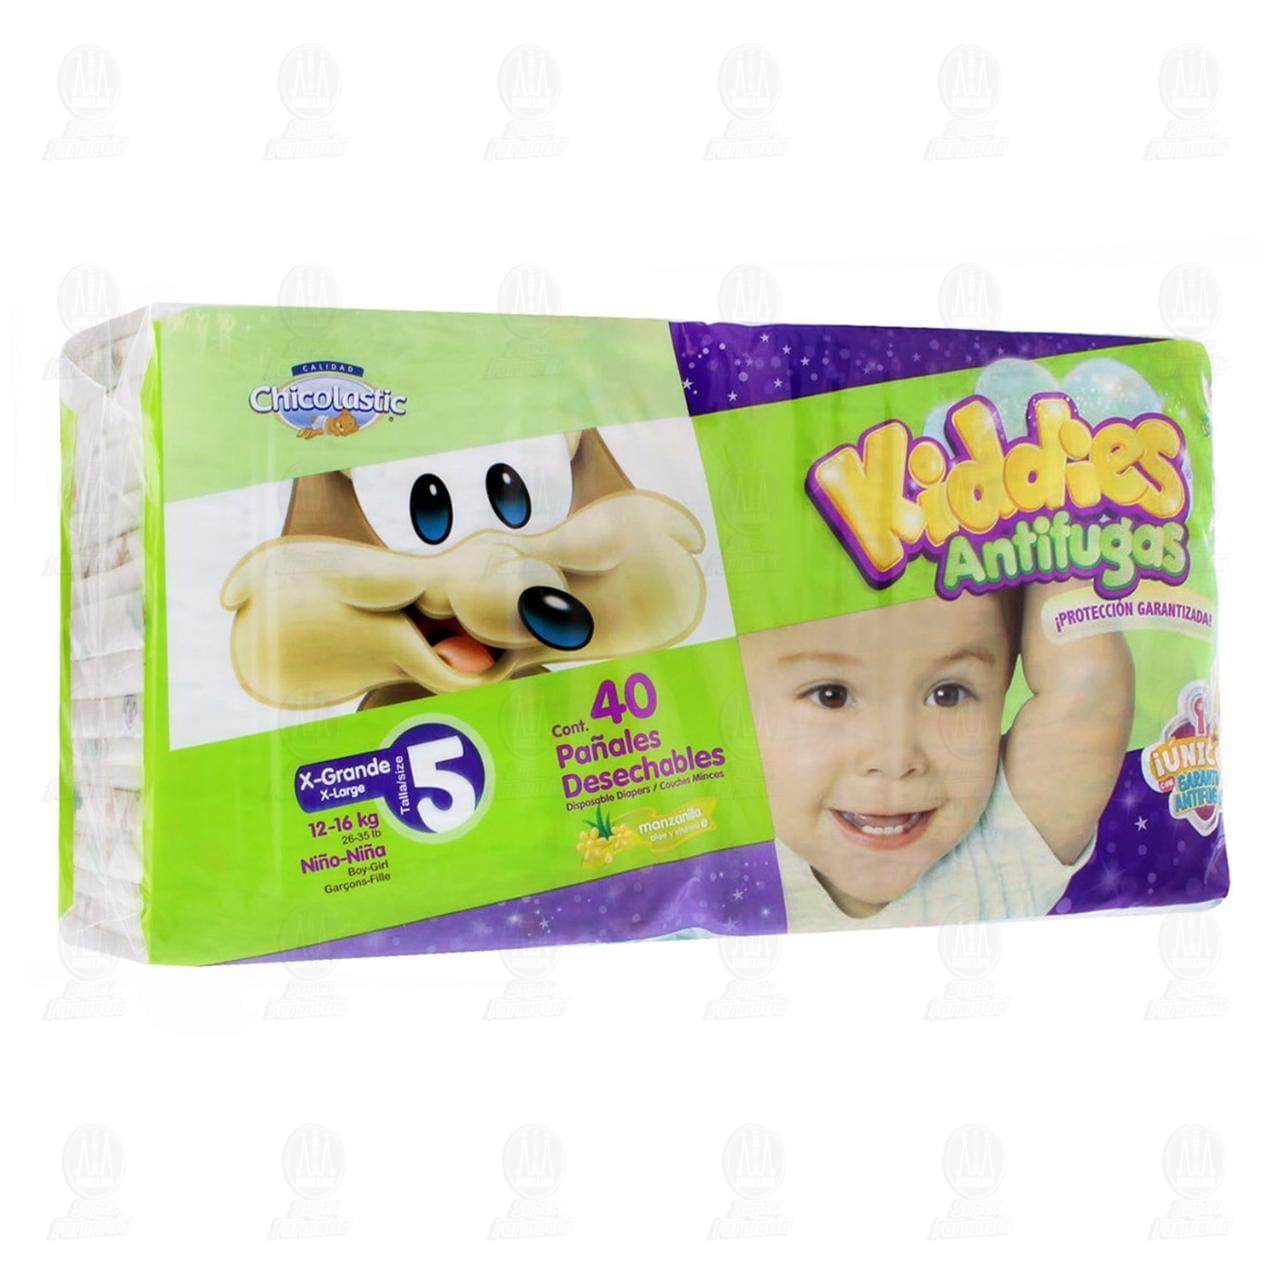 Pañales para Bebé Chicolastic Kiddies Antifugas Talla 5 XG, 40 pzas.